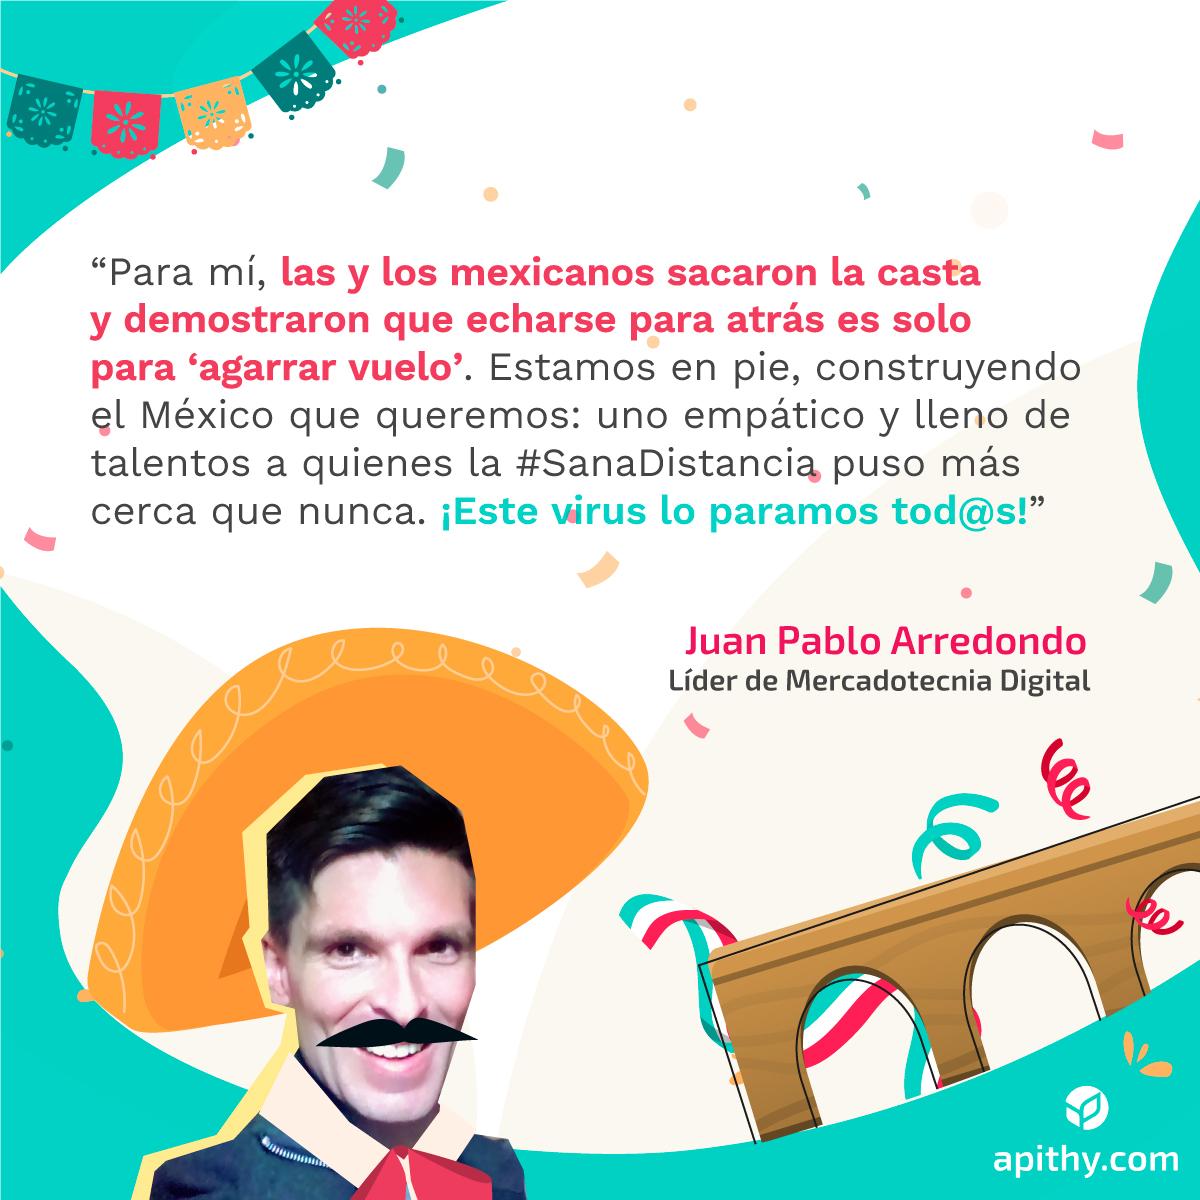 03 Juan Pablo Arredondo